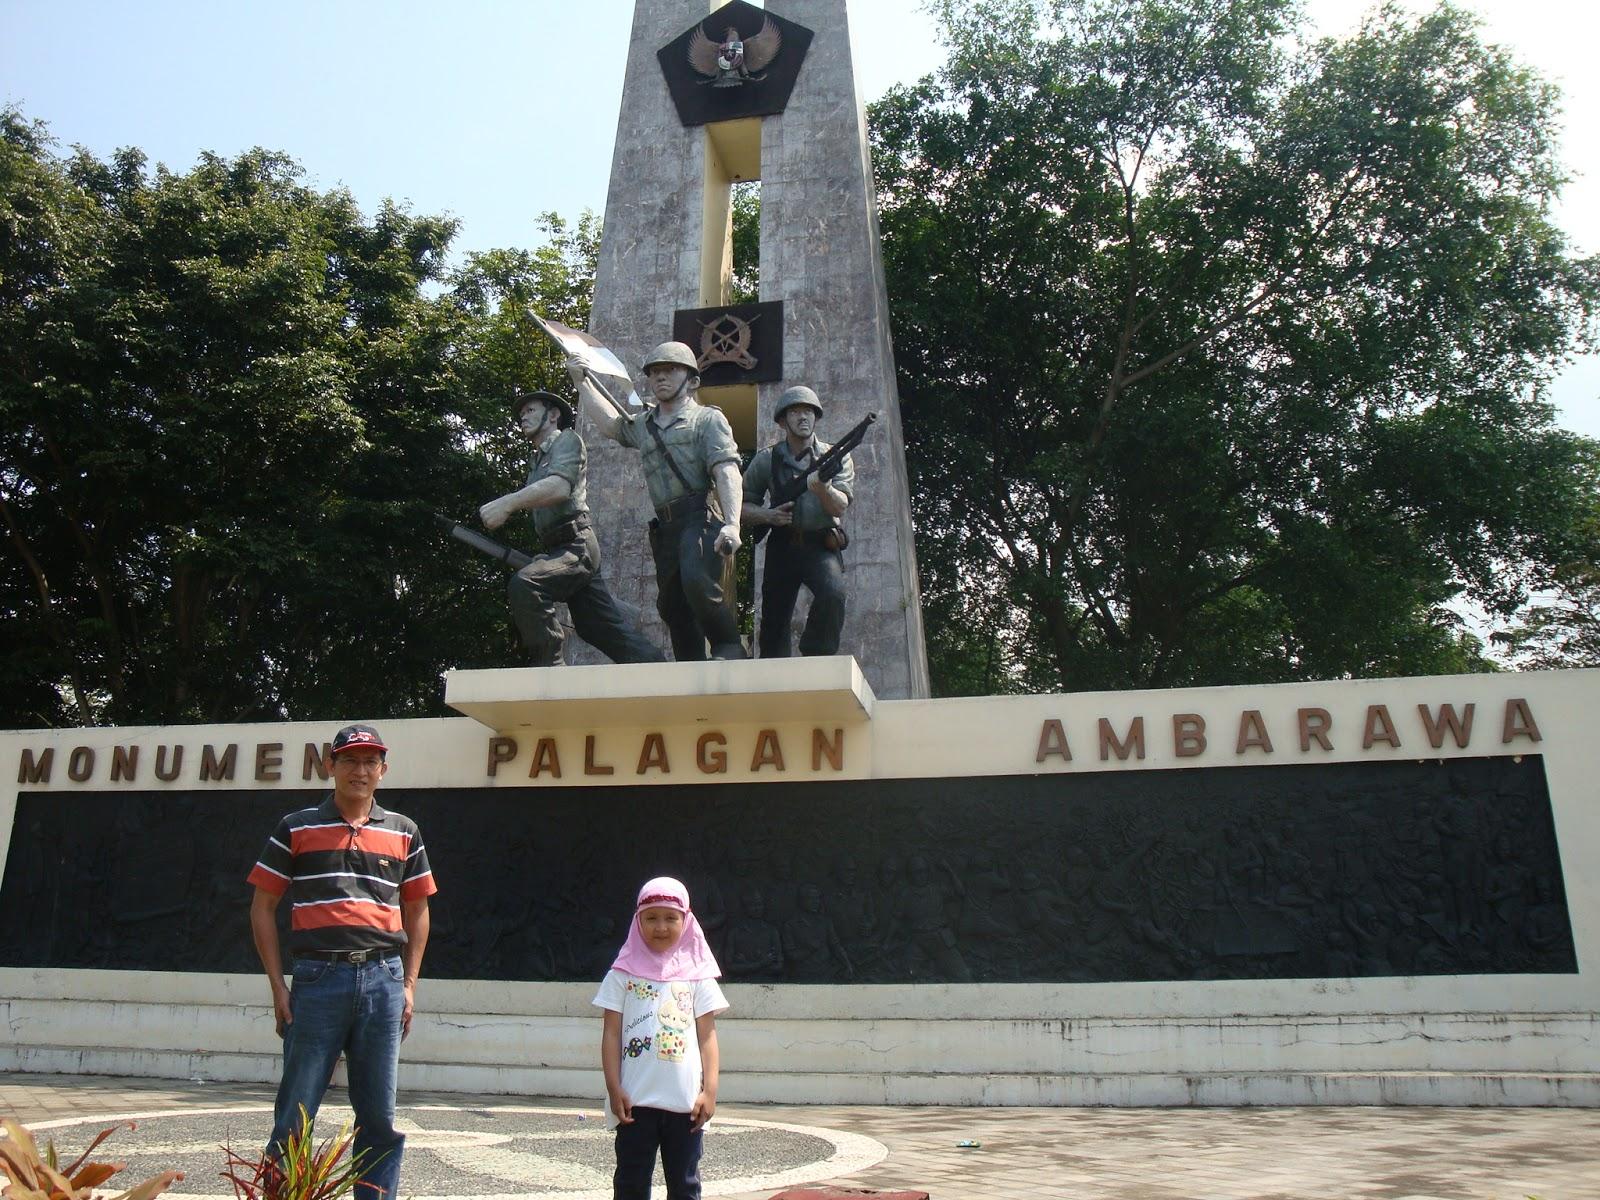 Firdaus Ubaidillah Monumen Palagan Ambarawa Semarang Jawa Tengah Salah Satu